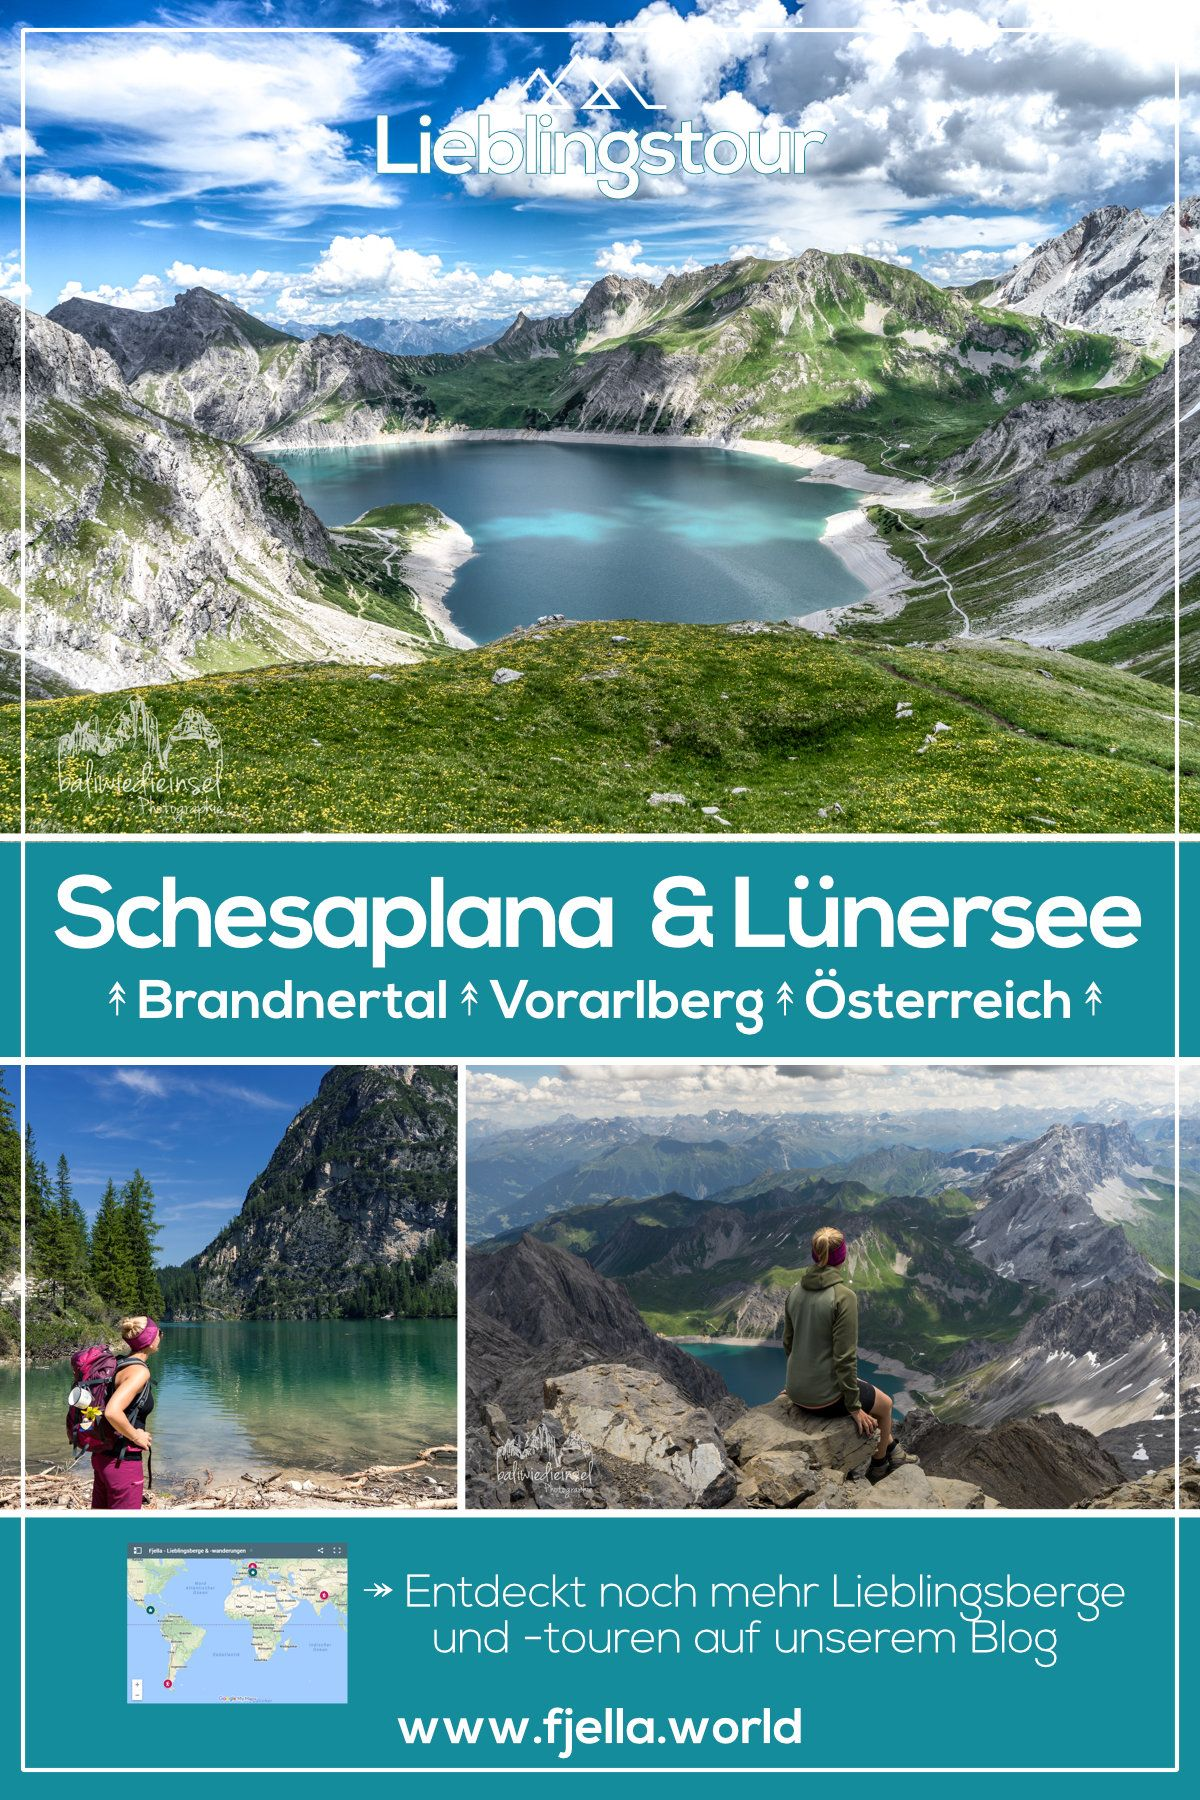 Photo of Fottur Schesaplana toppen og Lünersee